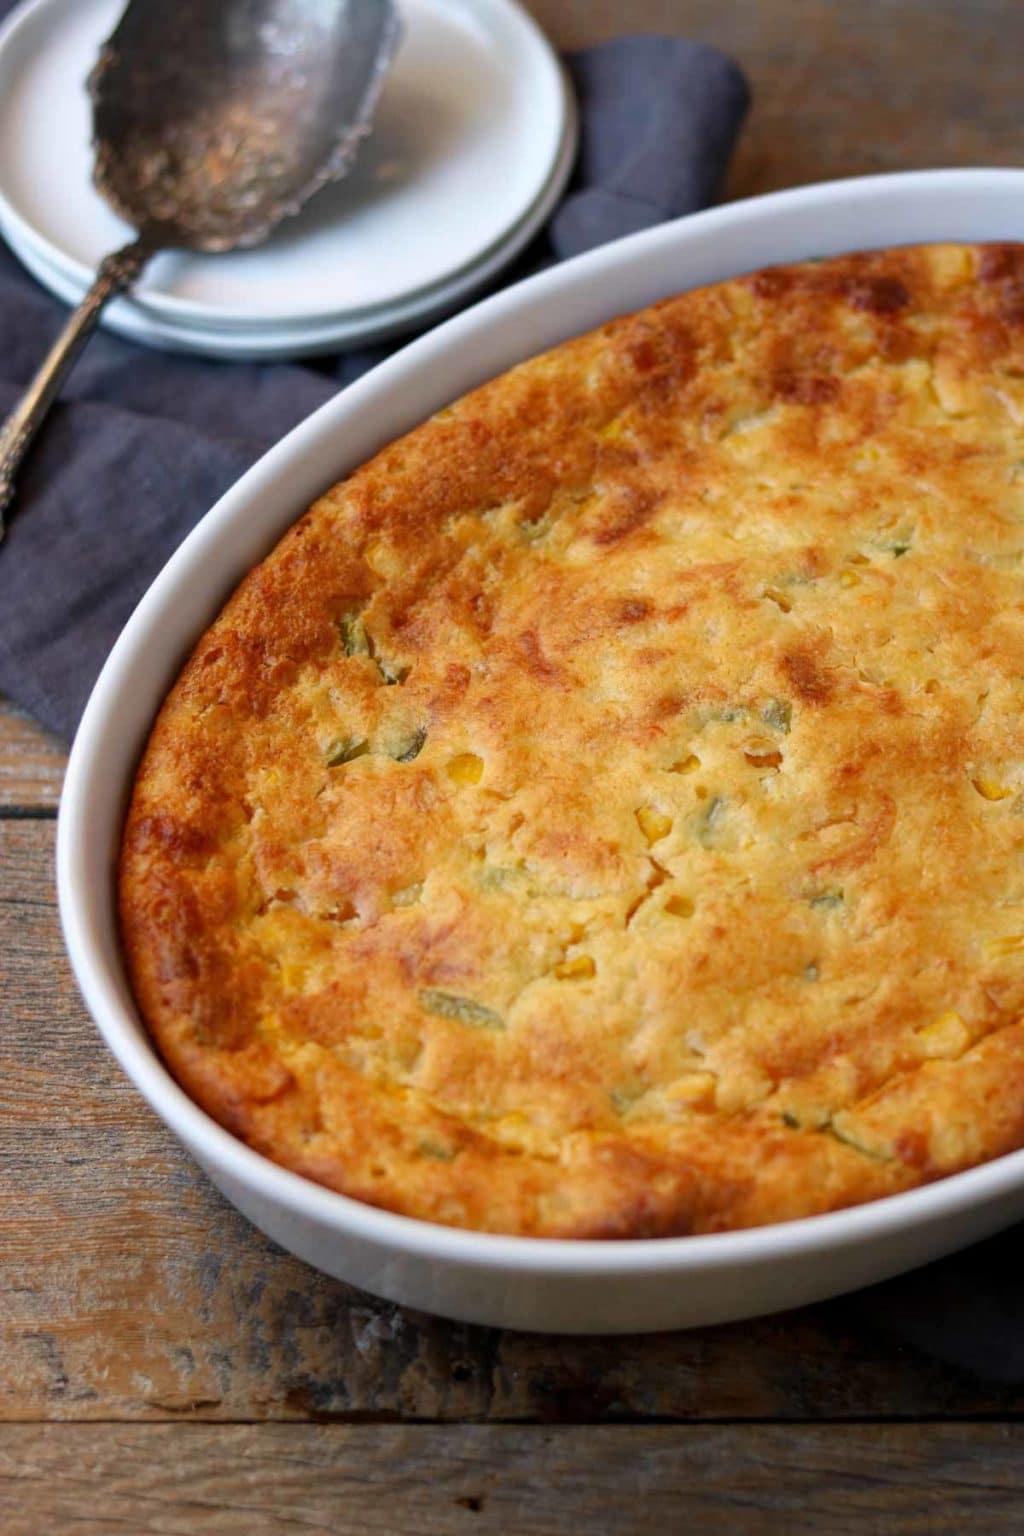 oval white casserole dish with jiffy corn casserole